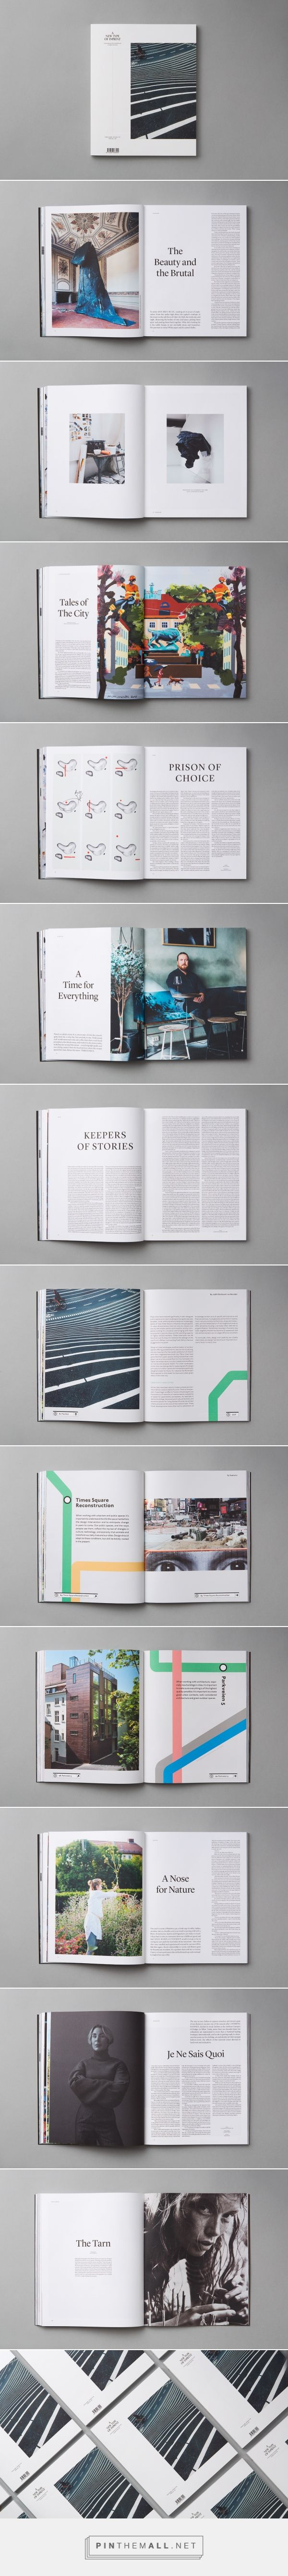 A New Type of Imprint VOL. 8 - Editorial Design